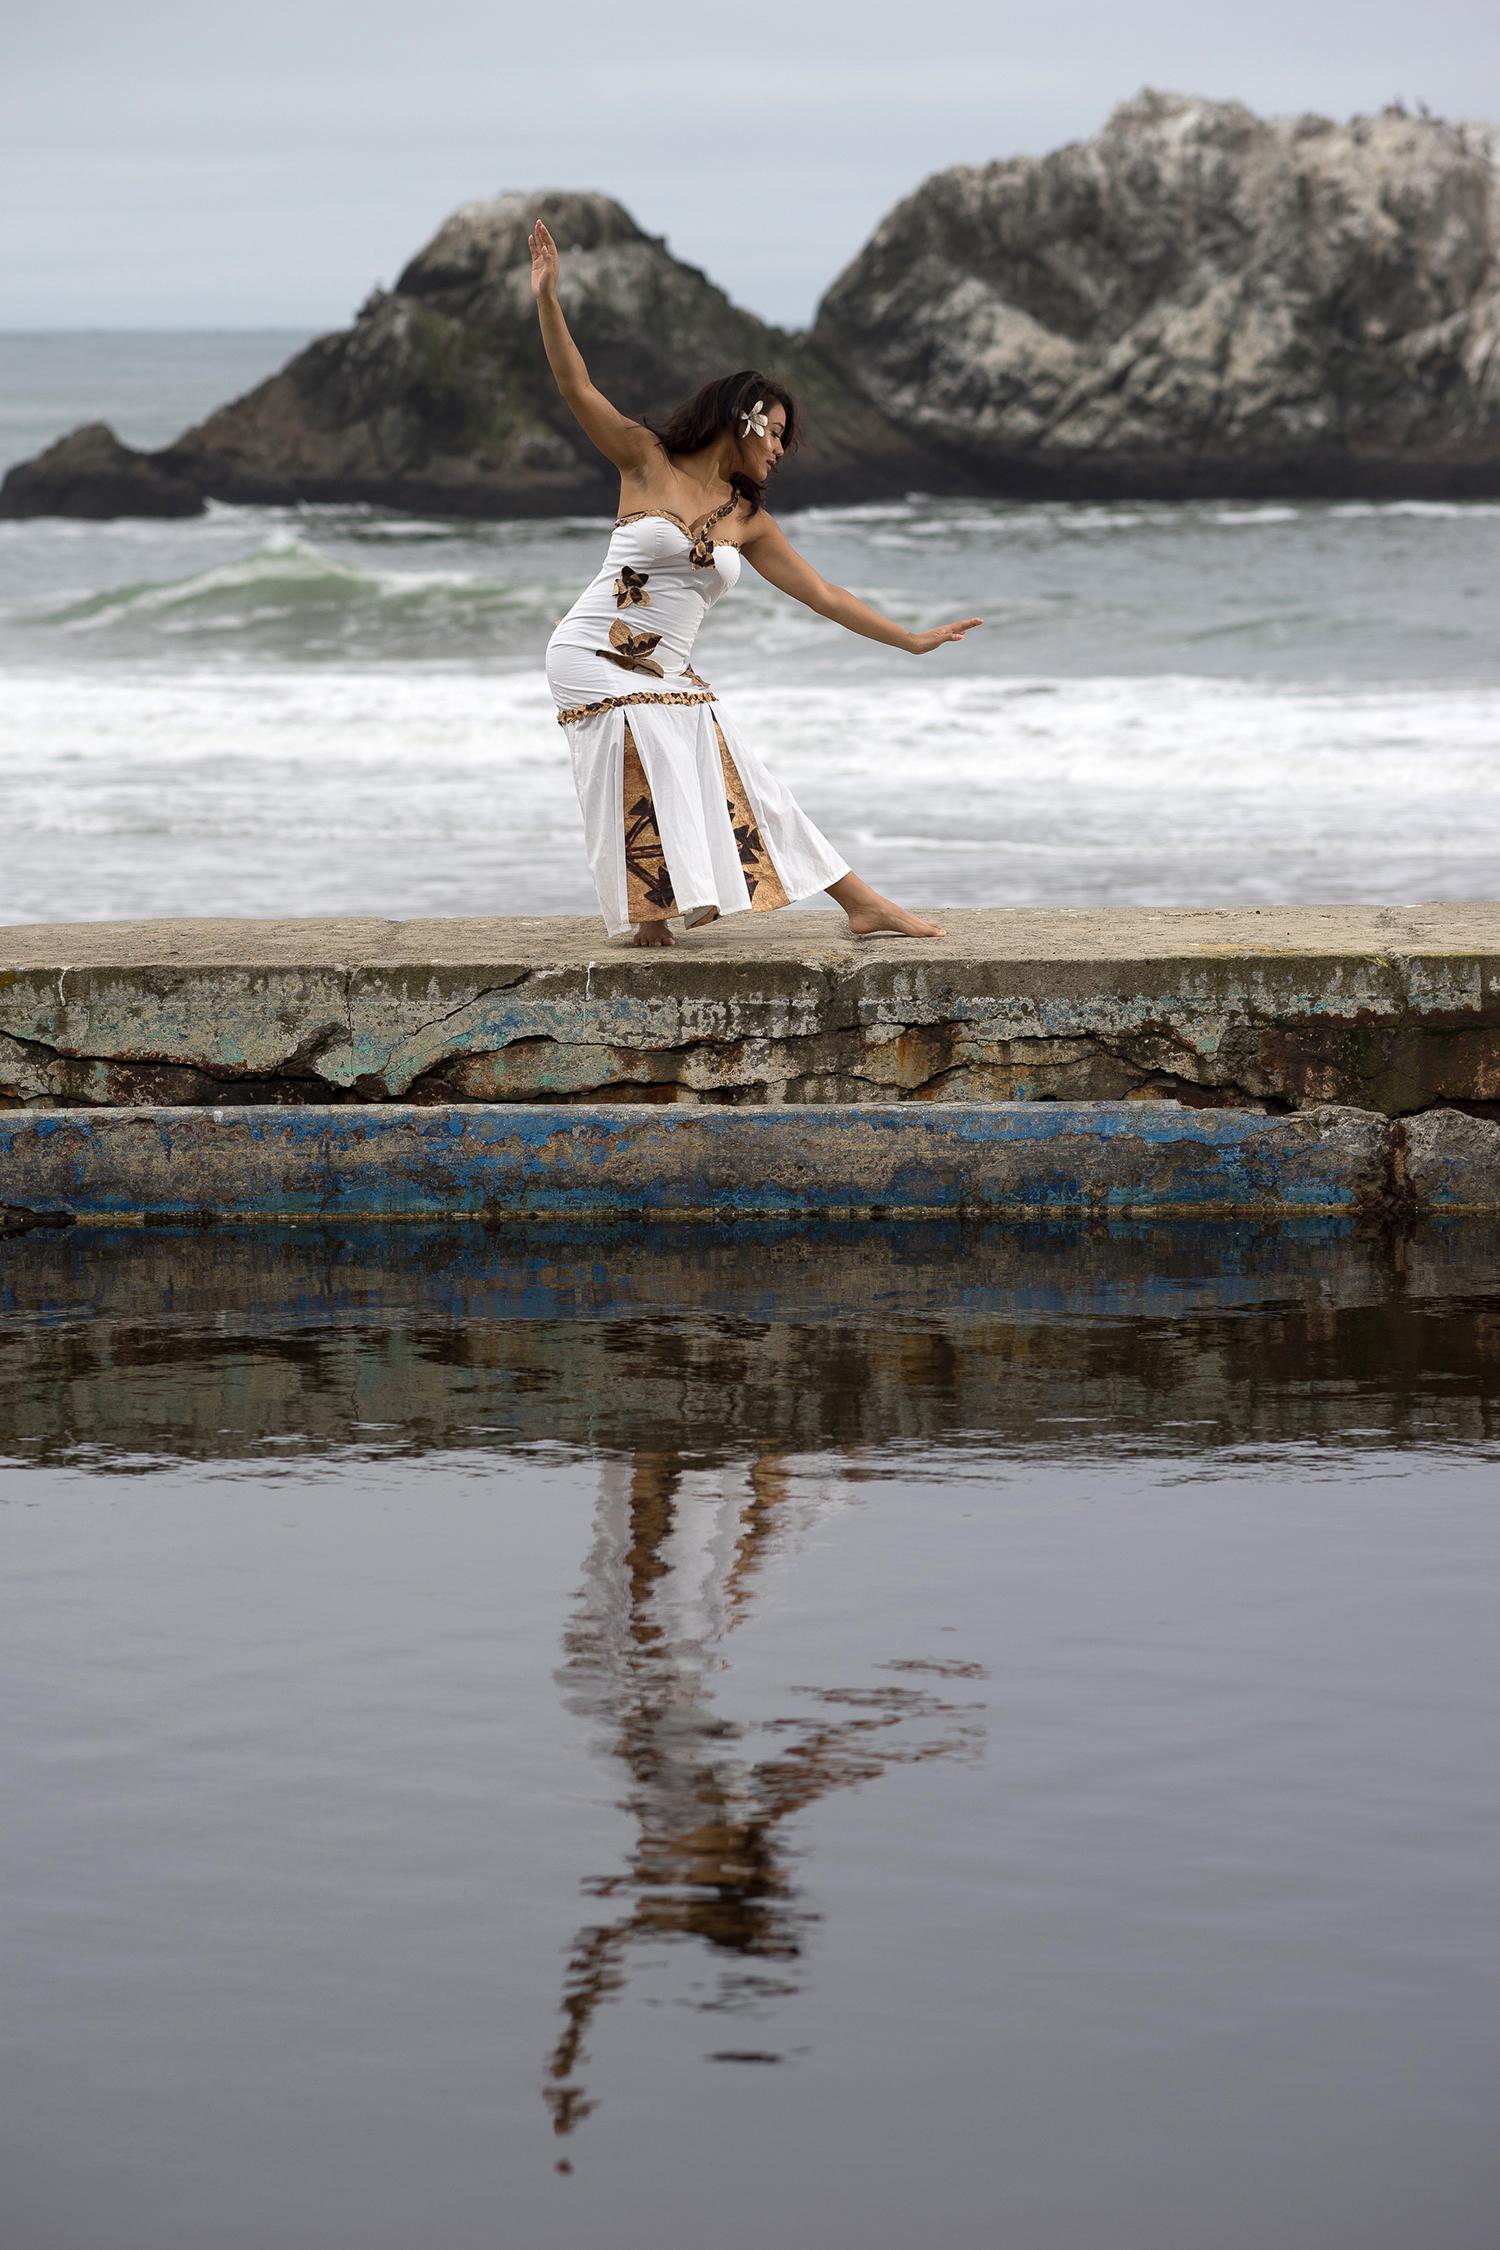 Manuia-Polynesian-Revue-Portrait-Luxchromatic-Photography-Hula-Dance-San-Francisco-Bay-Area-Sony-Alpha-A7Rii-Zeiss-Lens-Profoto-B1-B2-Wescott-Aloha-SonyAlpha-1064.jpg